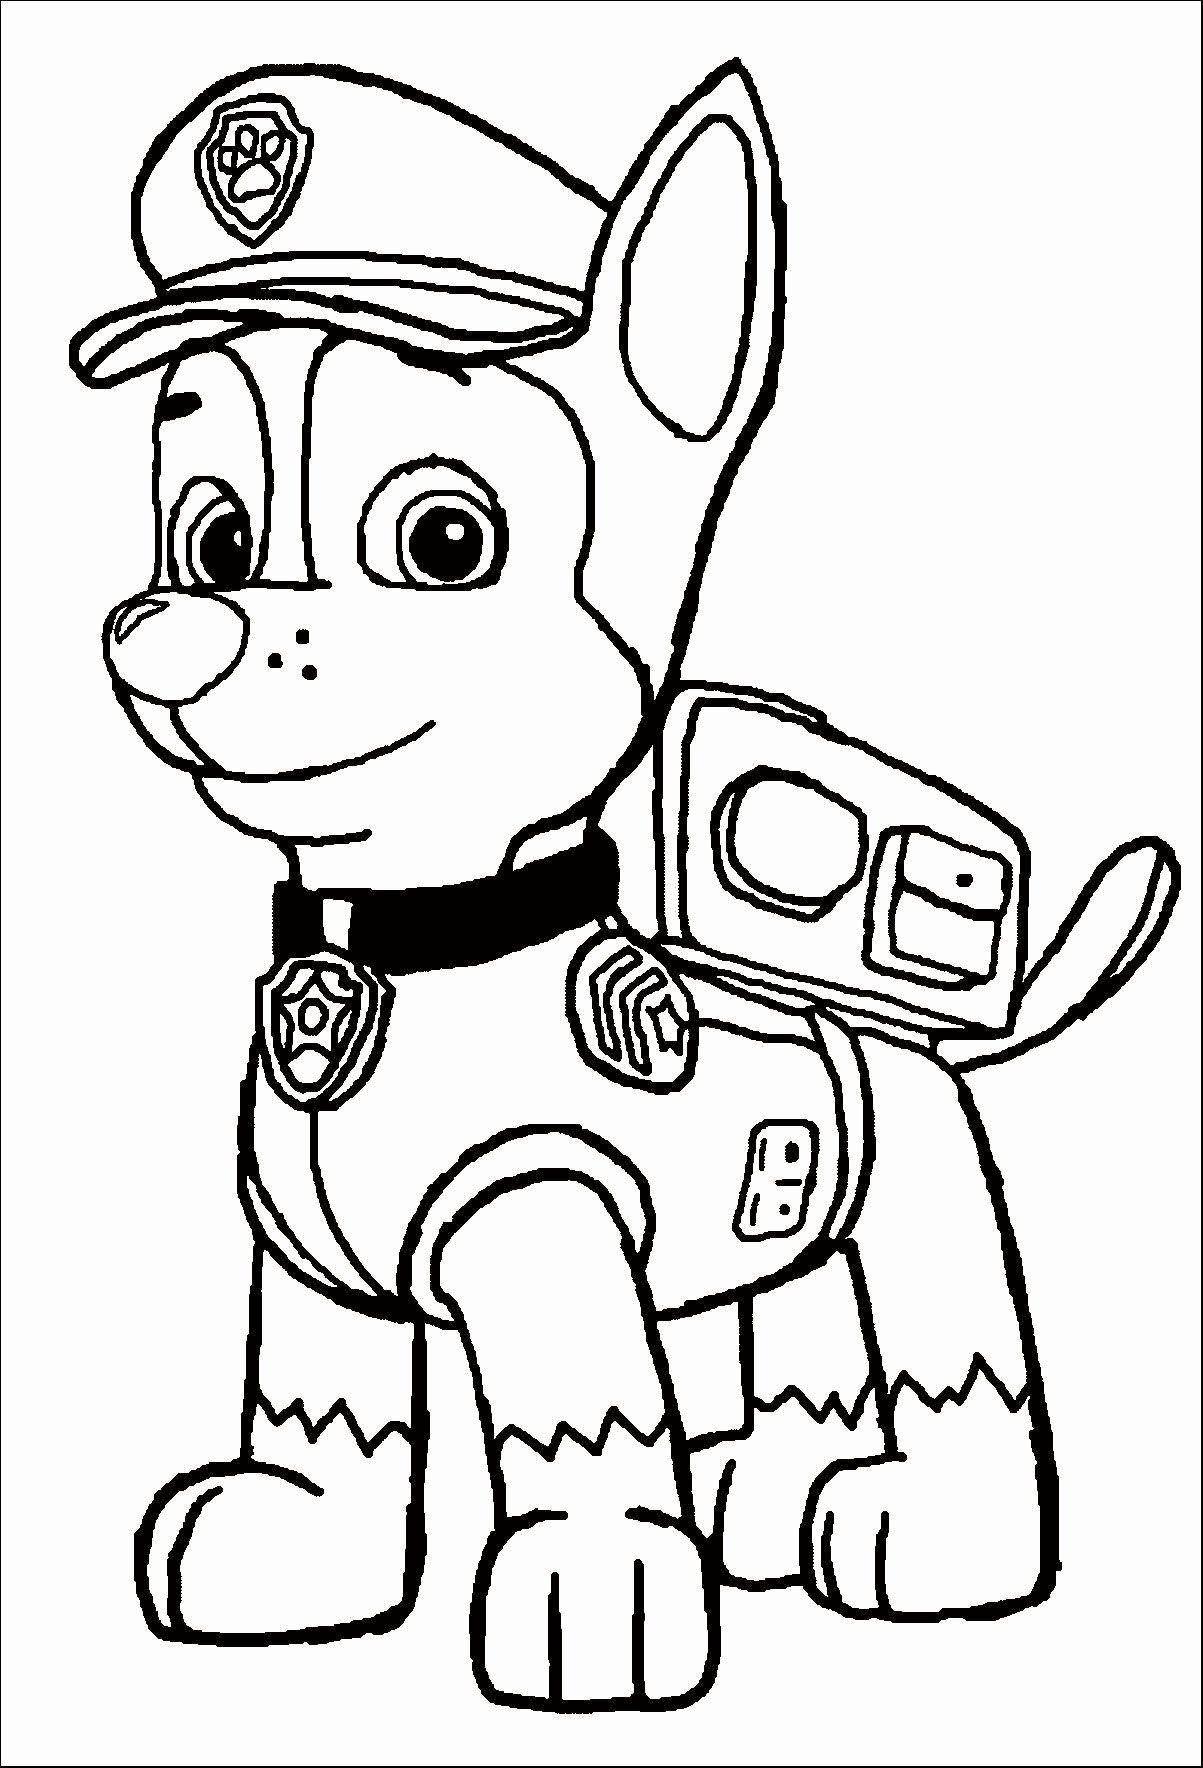 9 Paw Patrol Skye Coloring Page Coloringpagesinspiration Co Coloringpagesinspiration Halloween Coloring Pages Paw Patrol Coloring Pages Paw Patrol Coloring